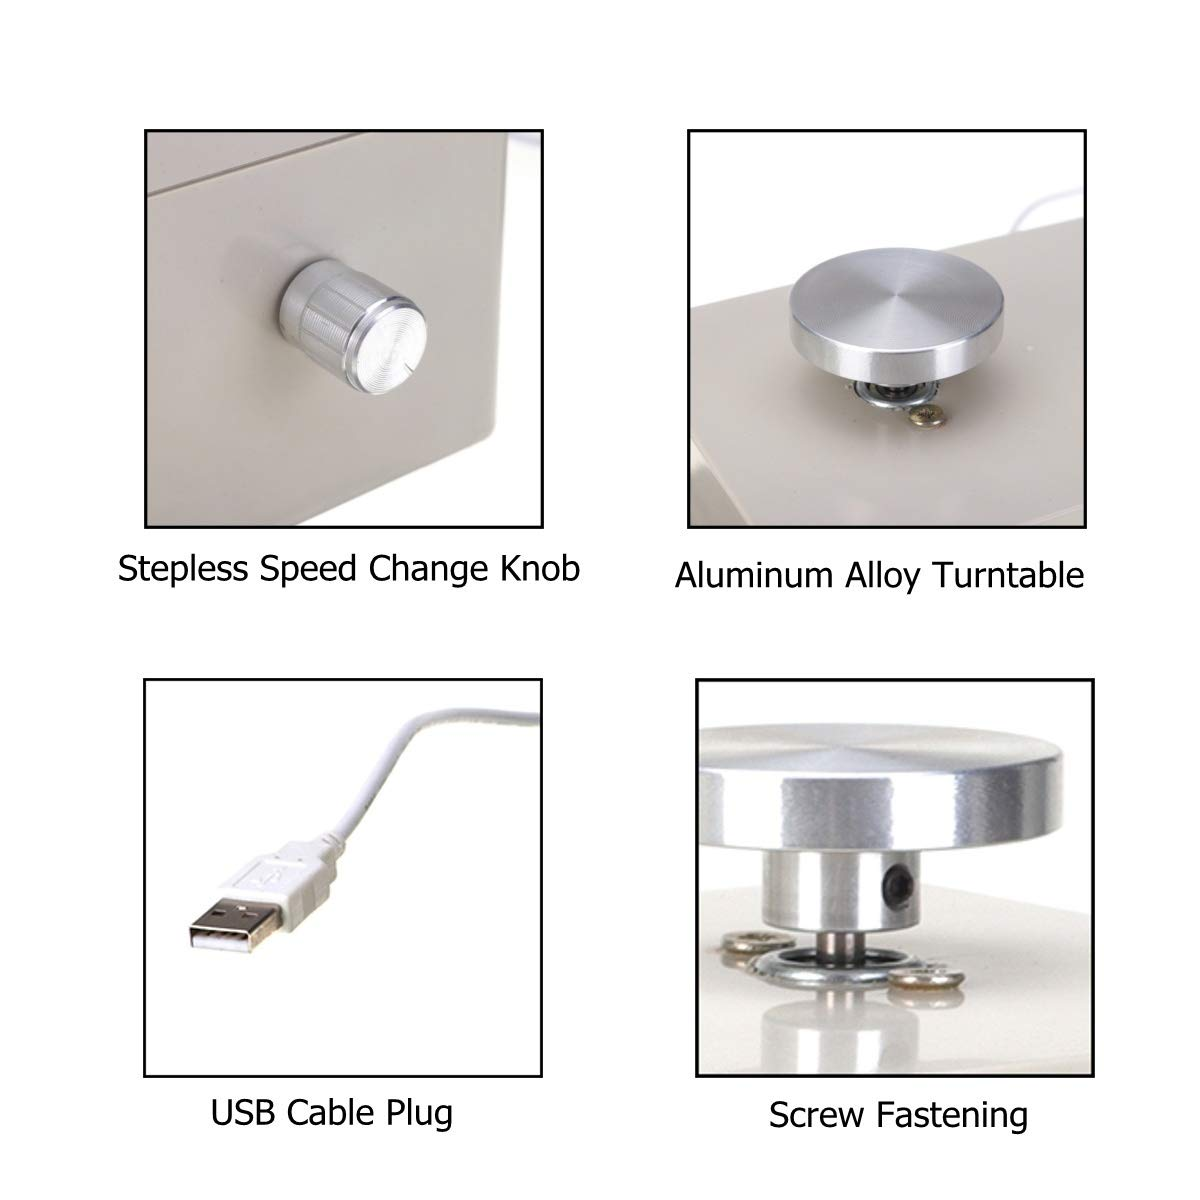 soring swallow 1PCS, Mini USB Electric Pottery Wheel Machine 5V USB 45mm 2000rpm Ceramic Clay Art Craft Work DIY Tool with 5pcs Wood Pottery Tools (Gift)